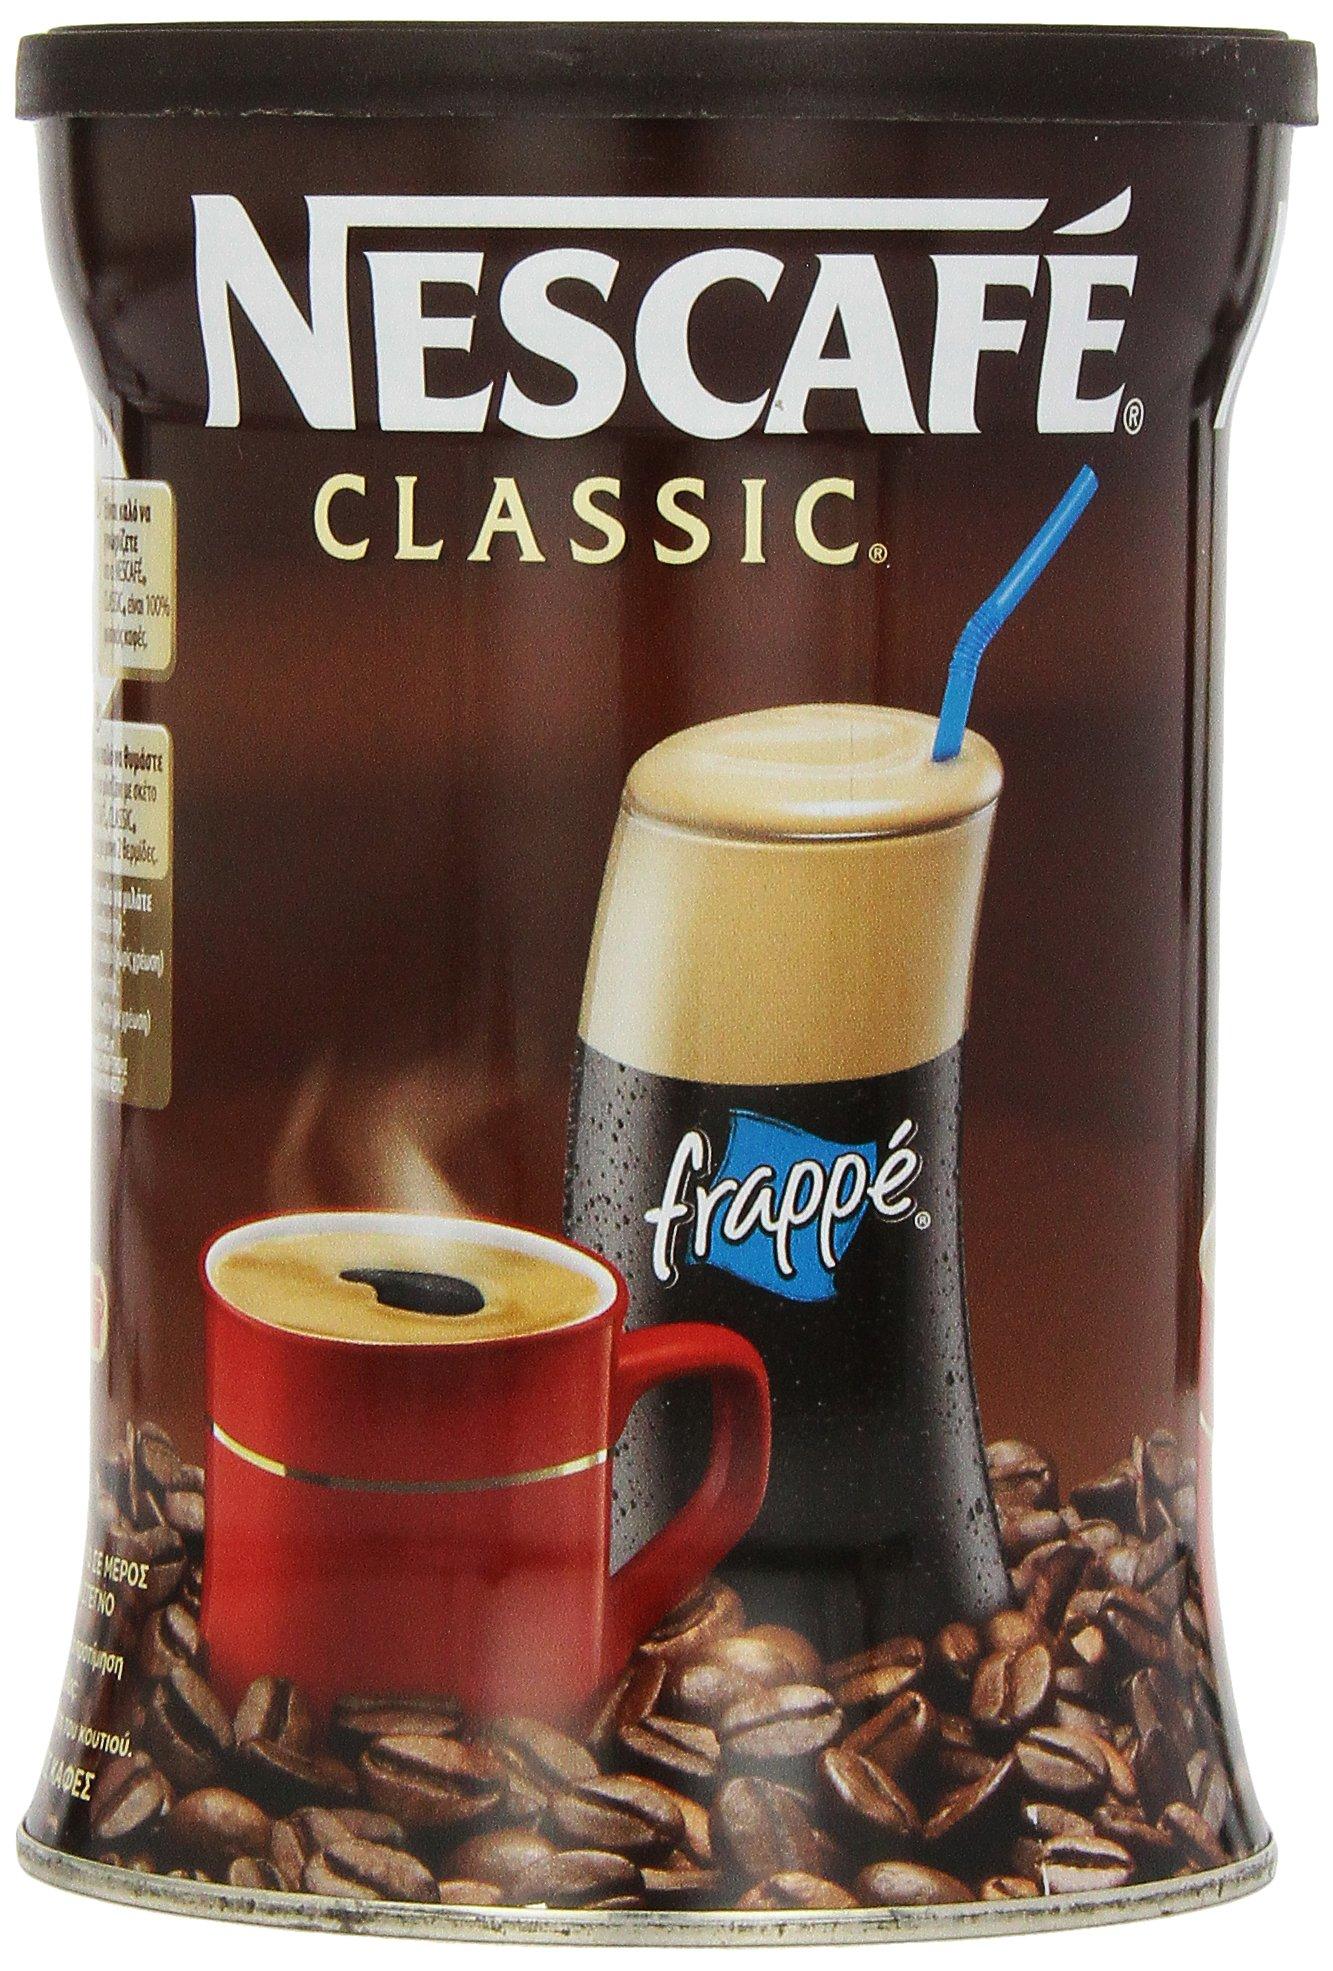 Nescafe Classic Instant Greek Coffee, 7.08 Ounce